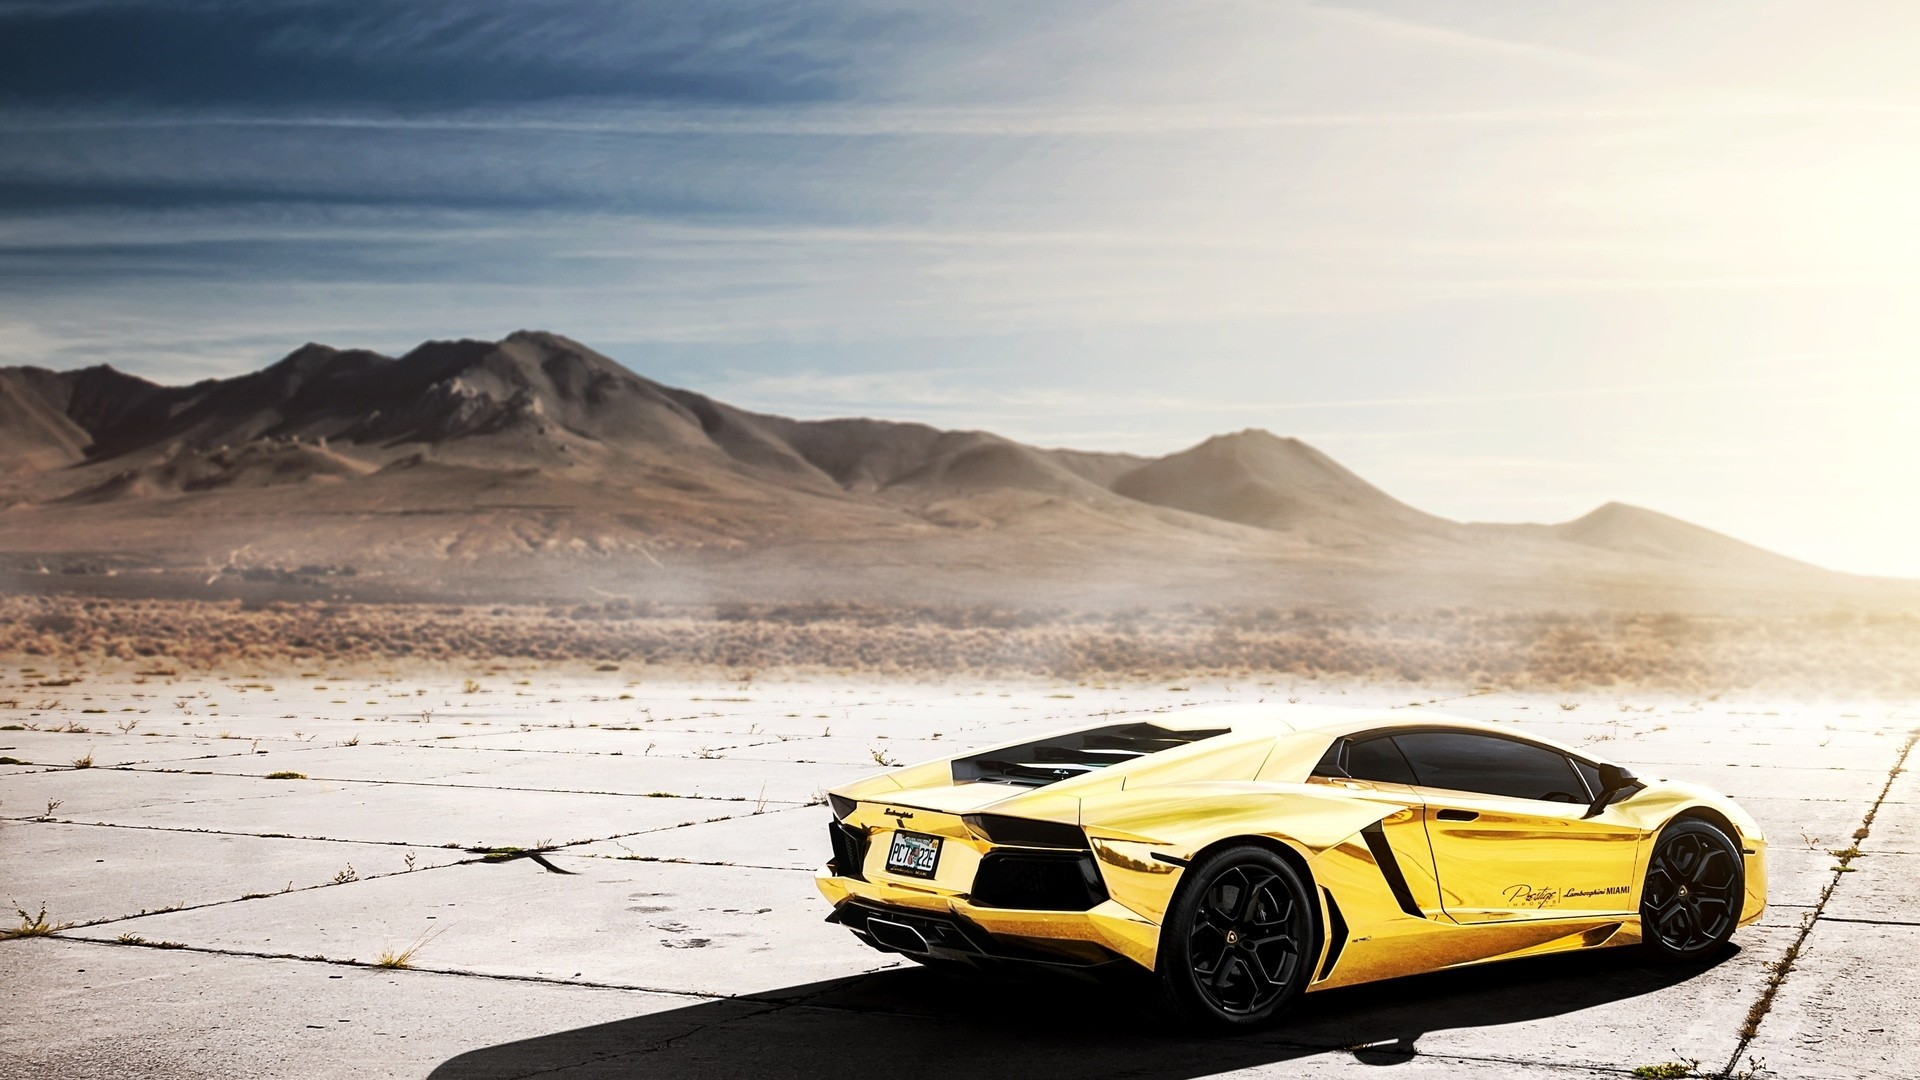 Gold Lamborghini PC Wallpaper HD